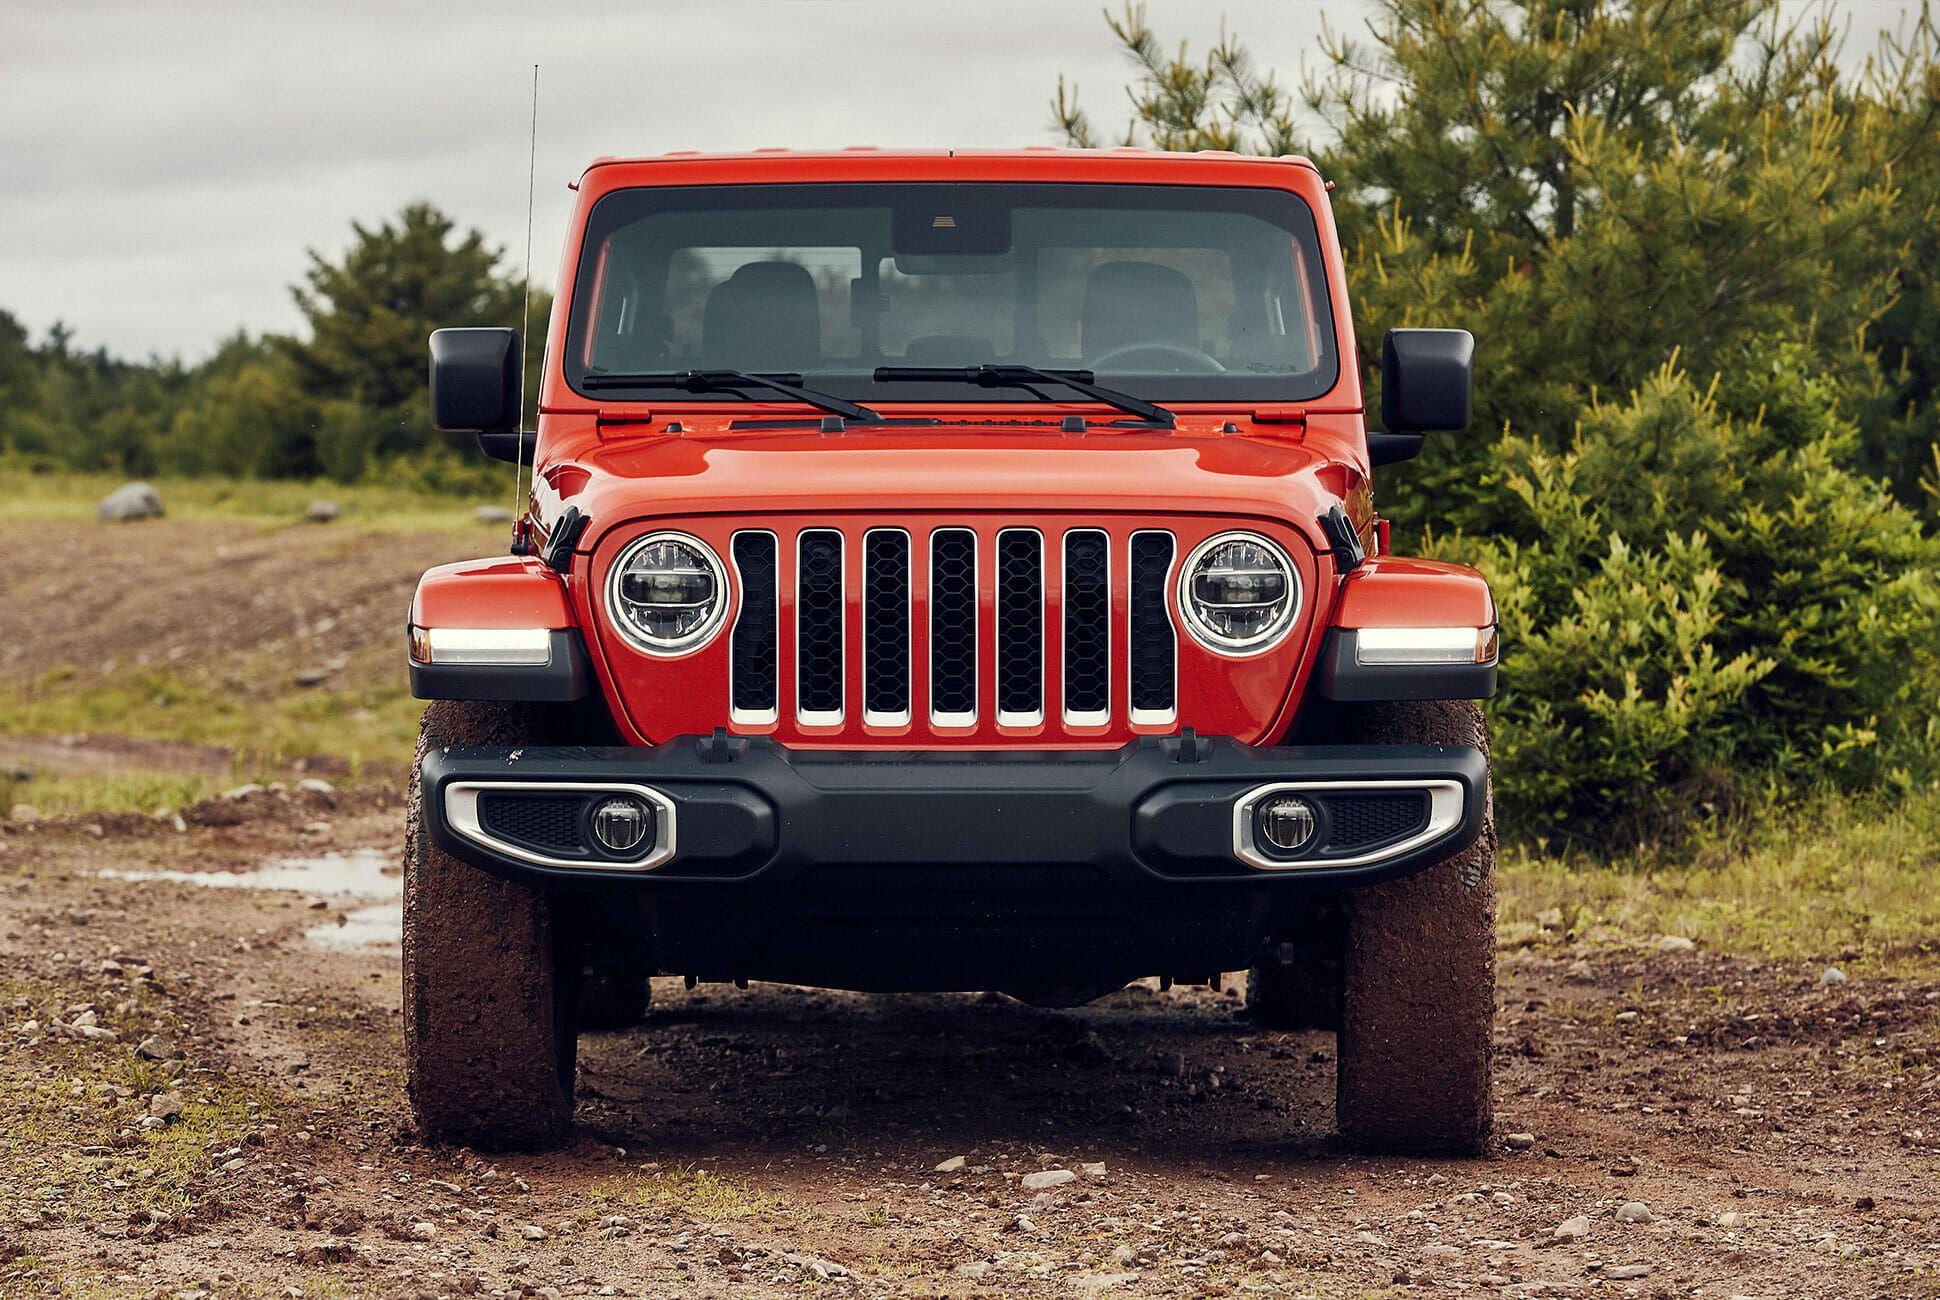 Jeep-Gladiator-Review-Gear-Patrol-slide-2